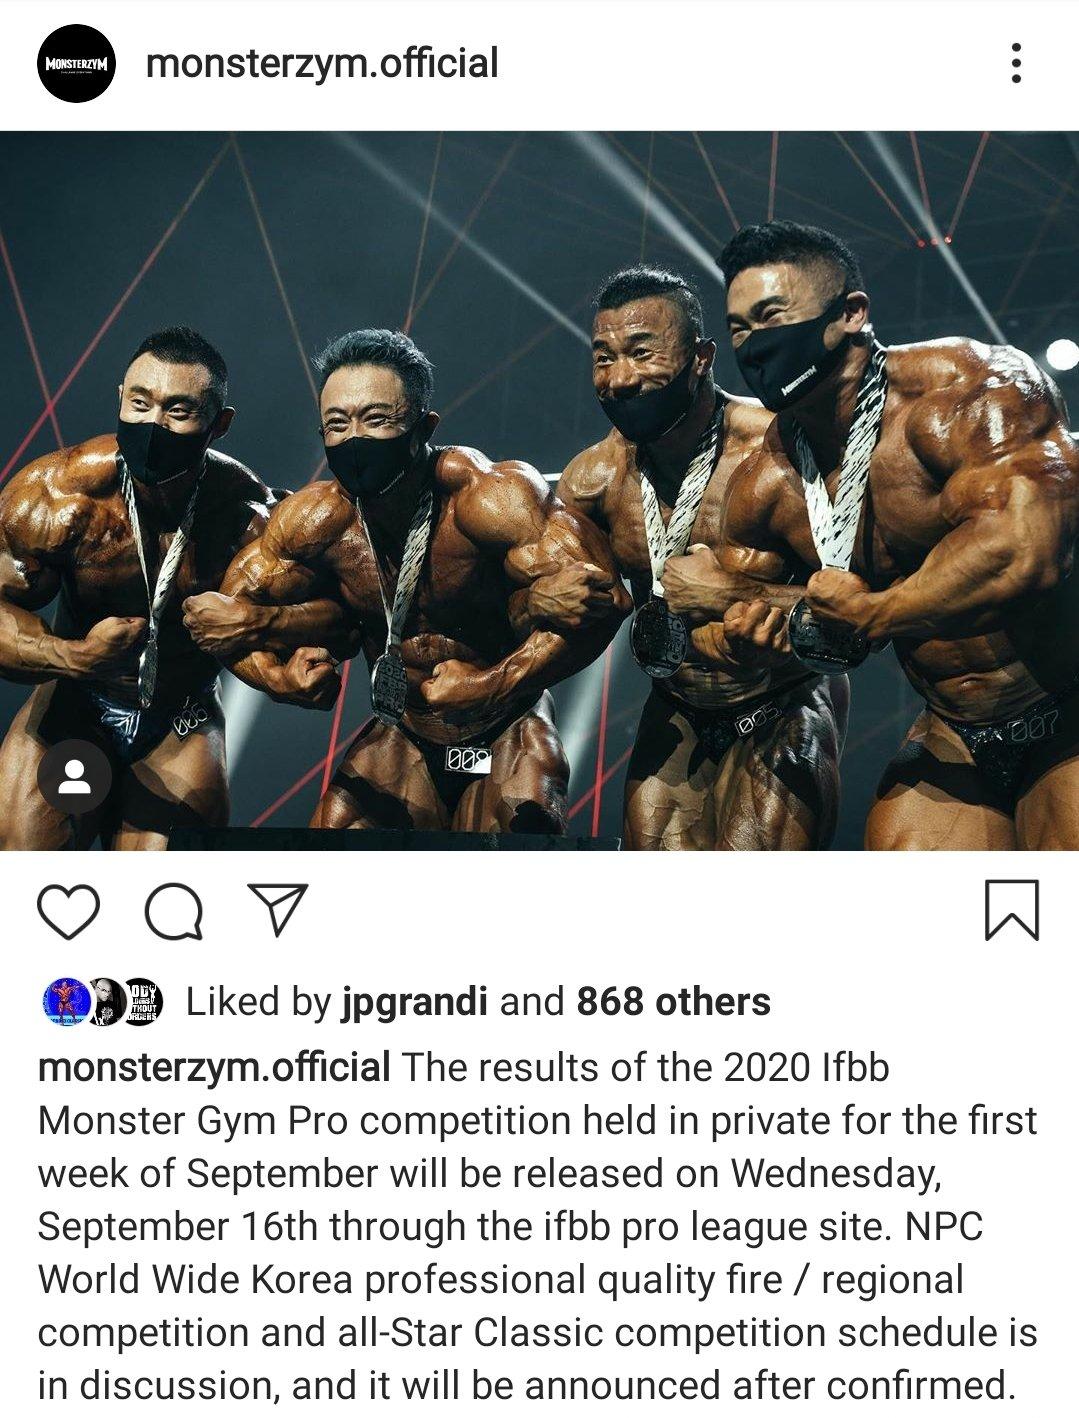 monsterzym athletes secrecy